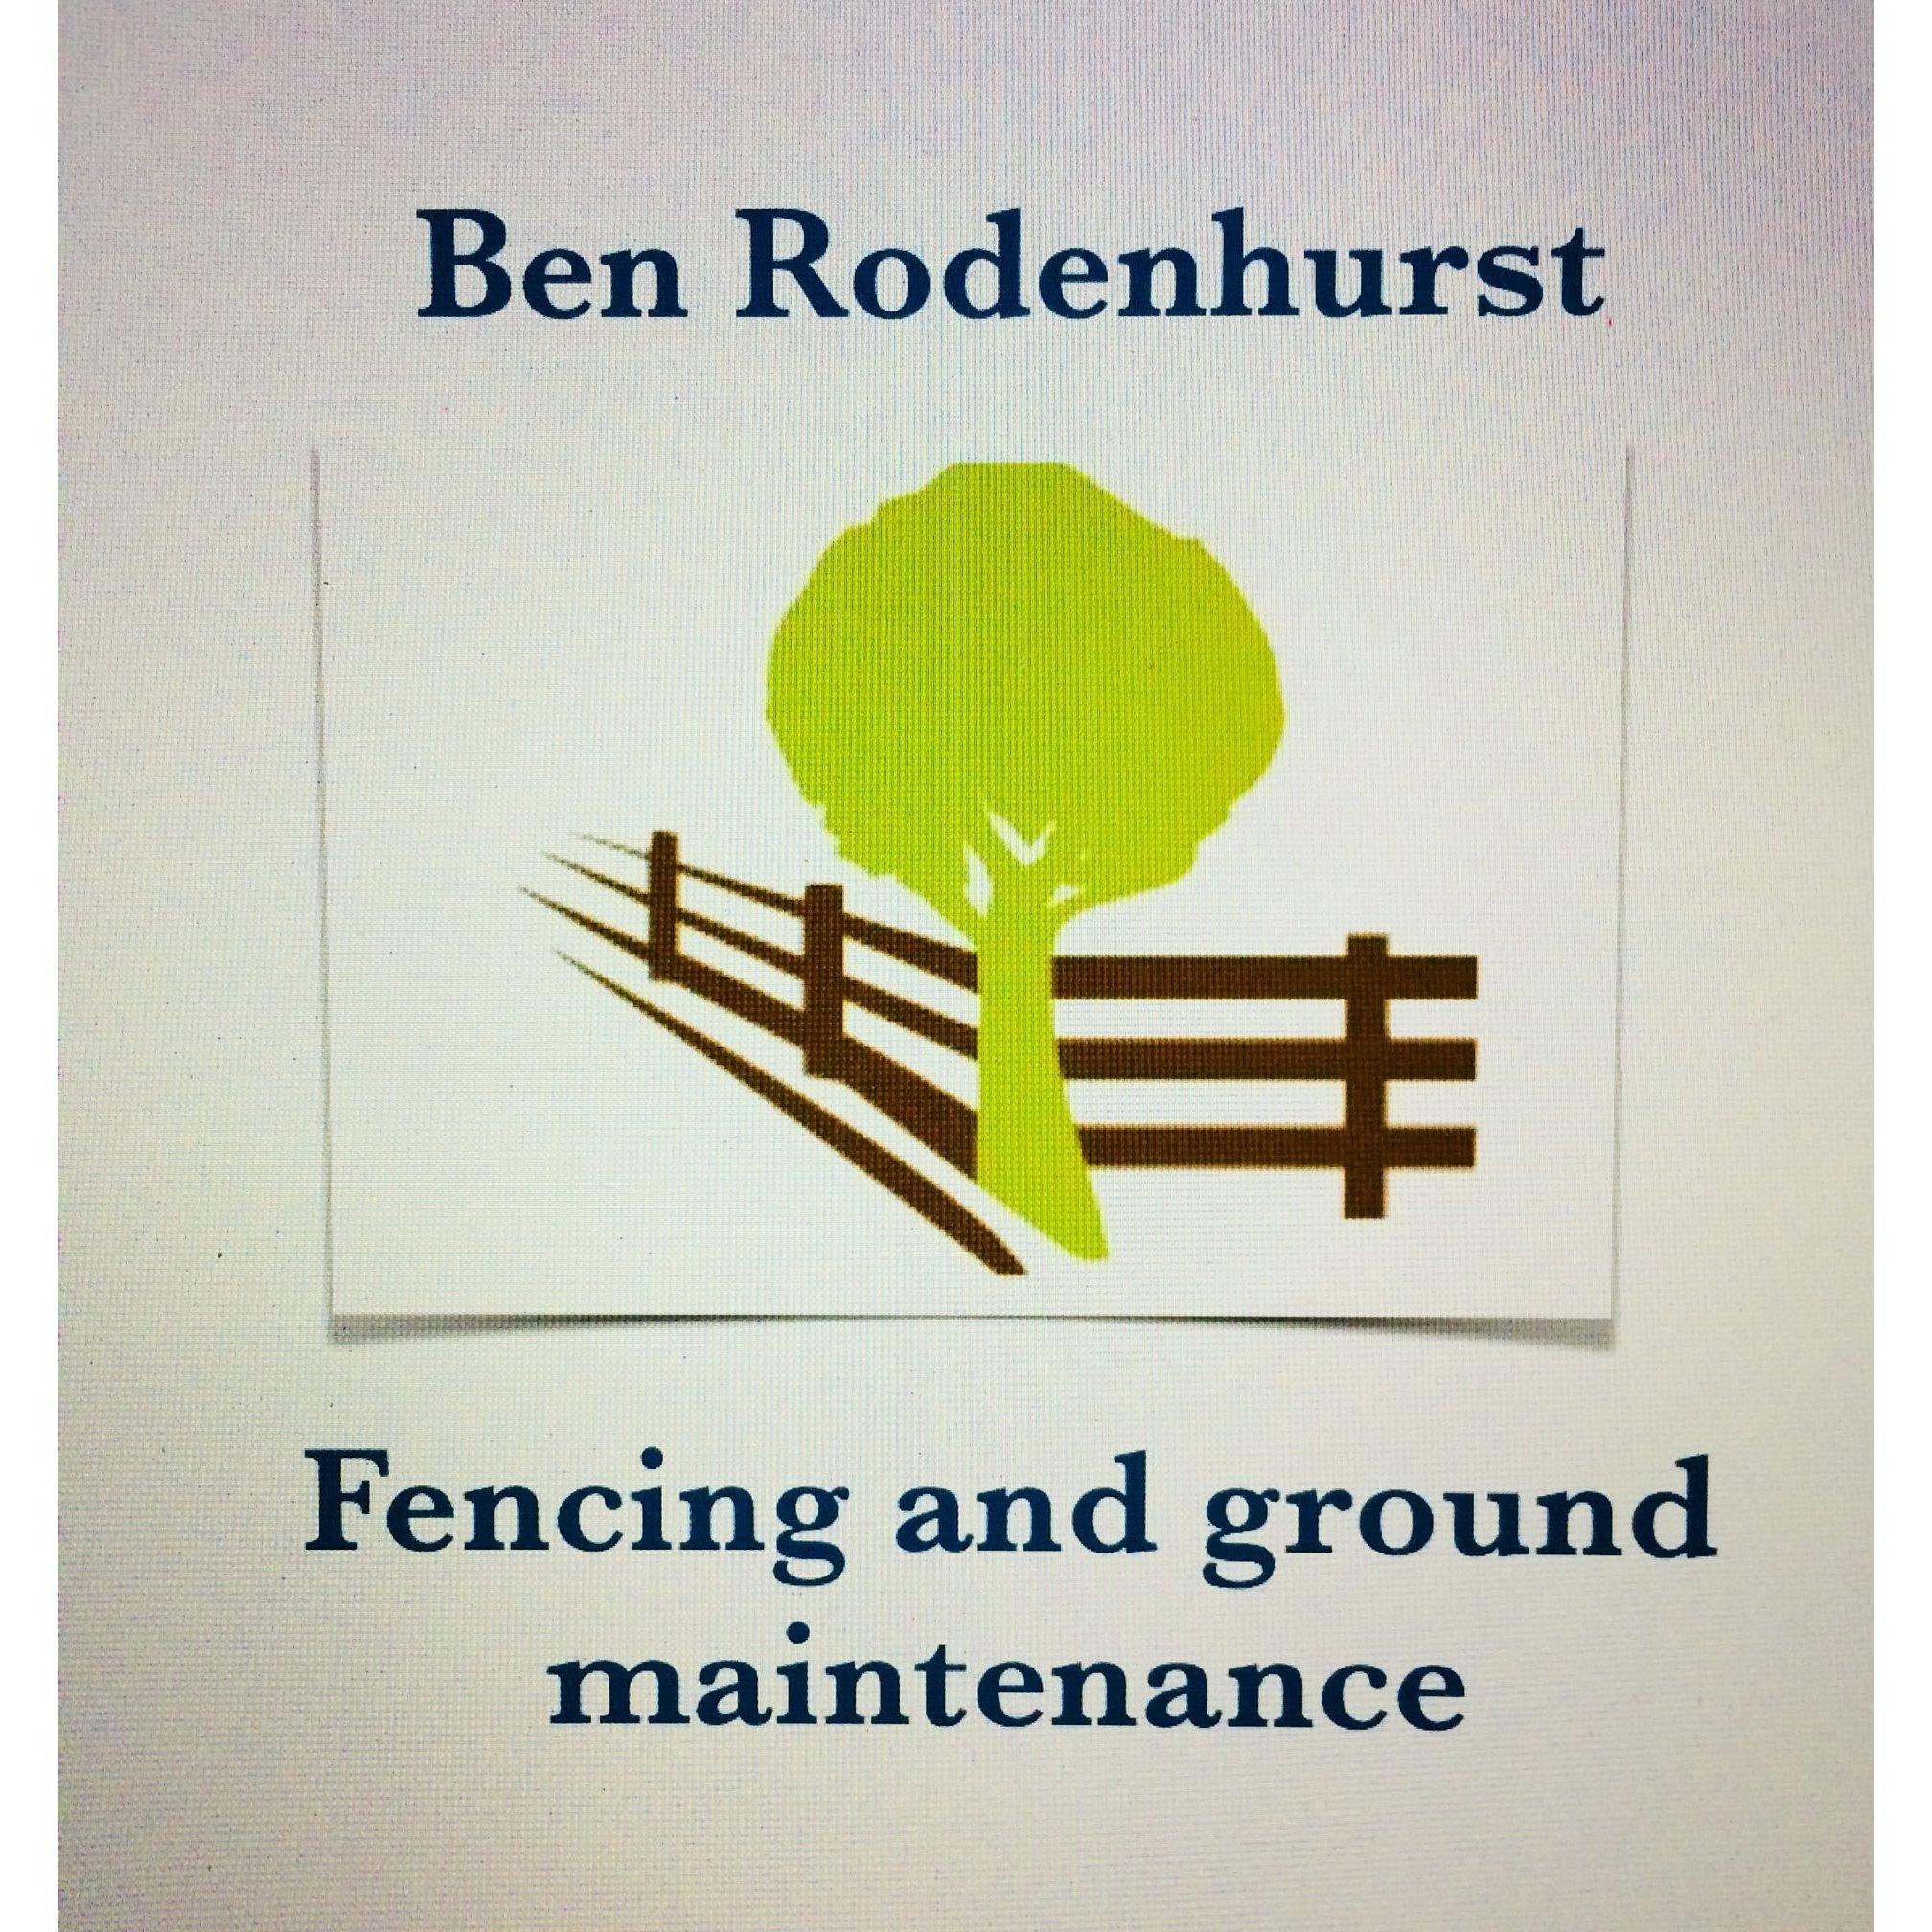 Ben Rodenhurst Fencing